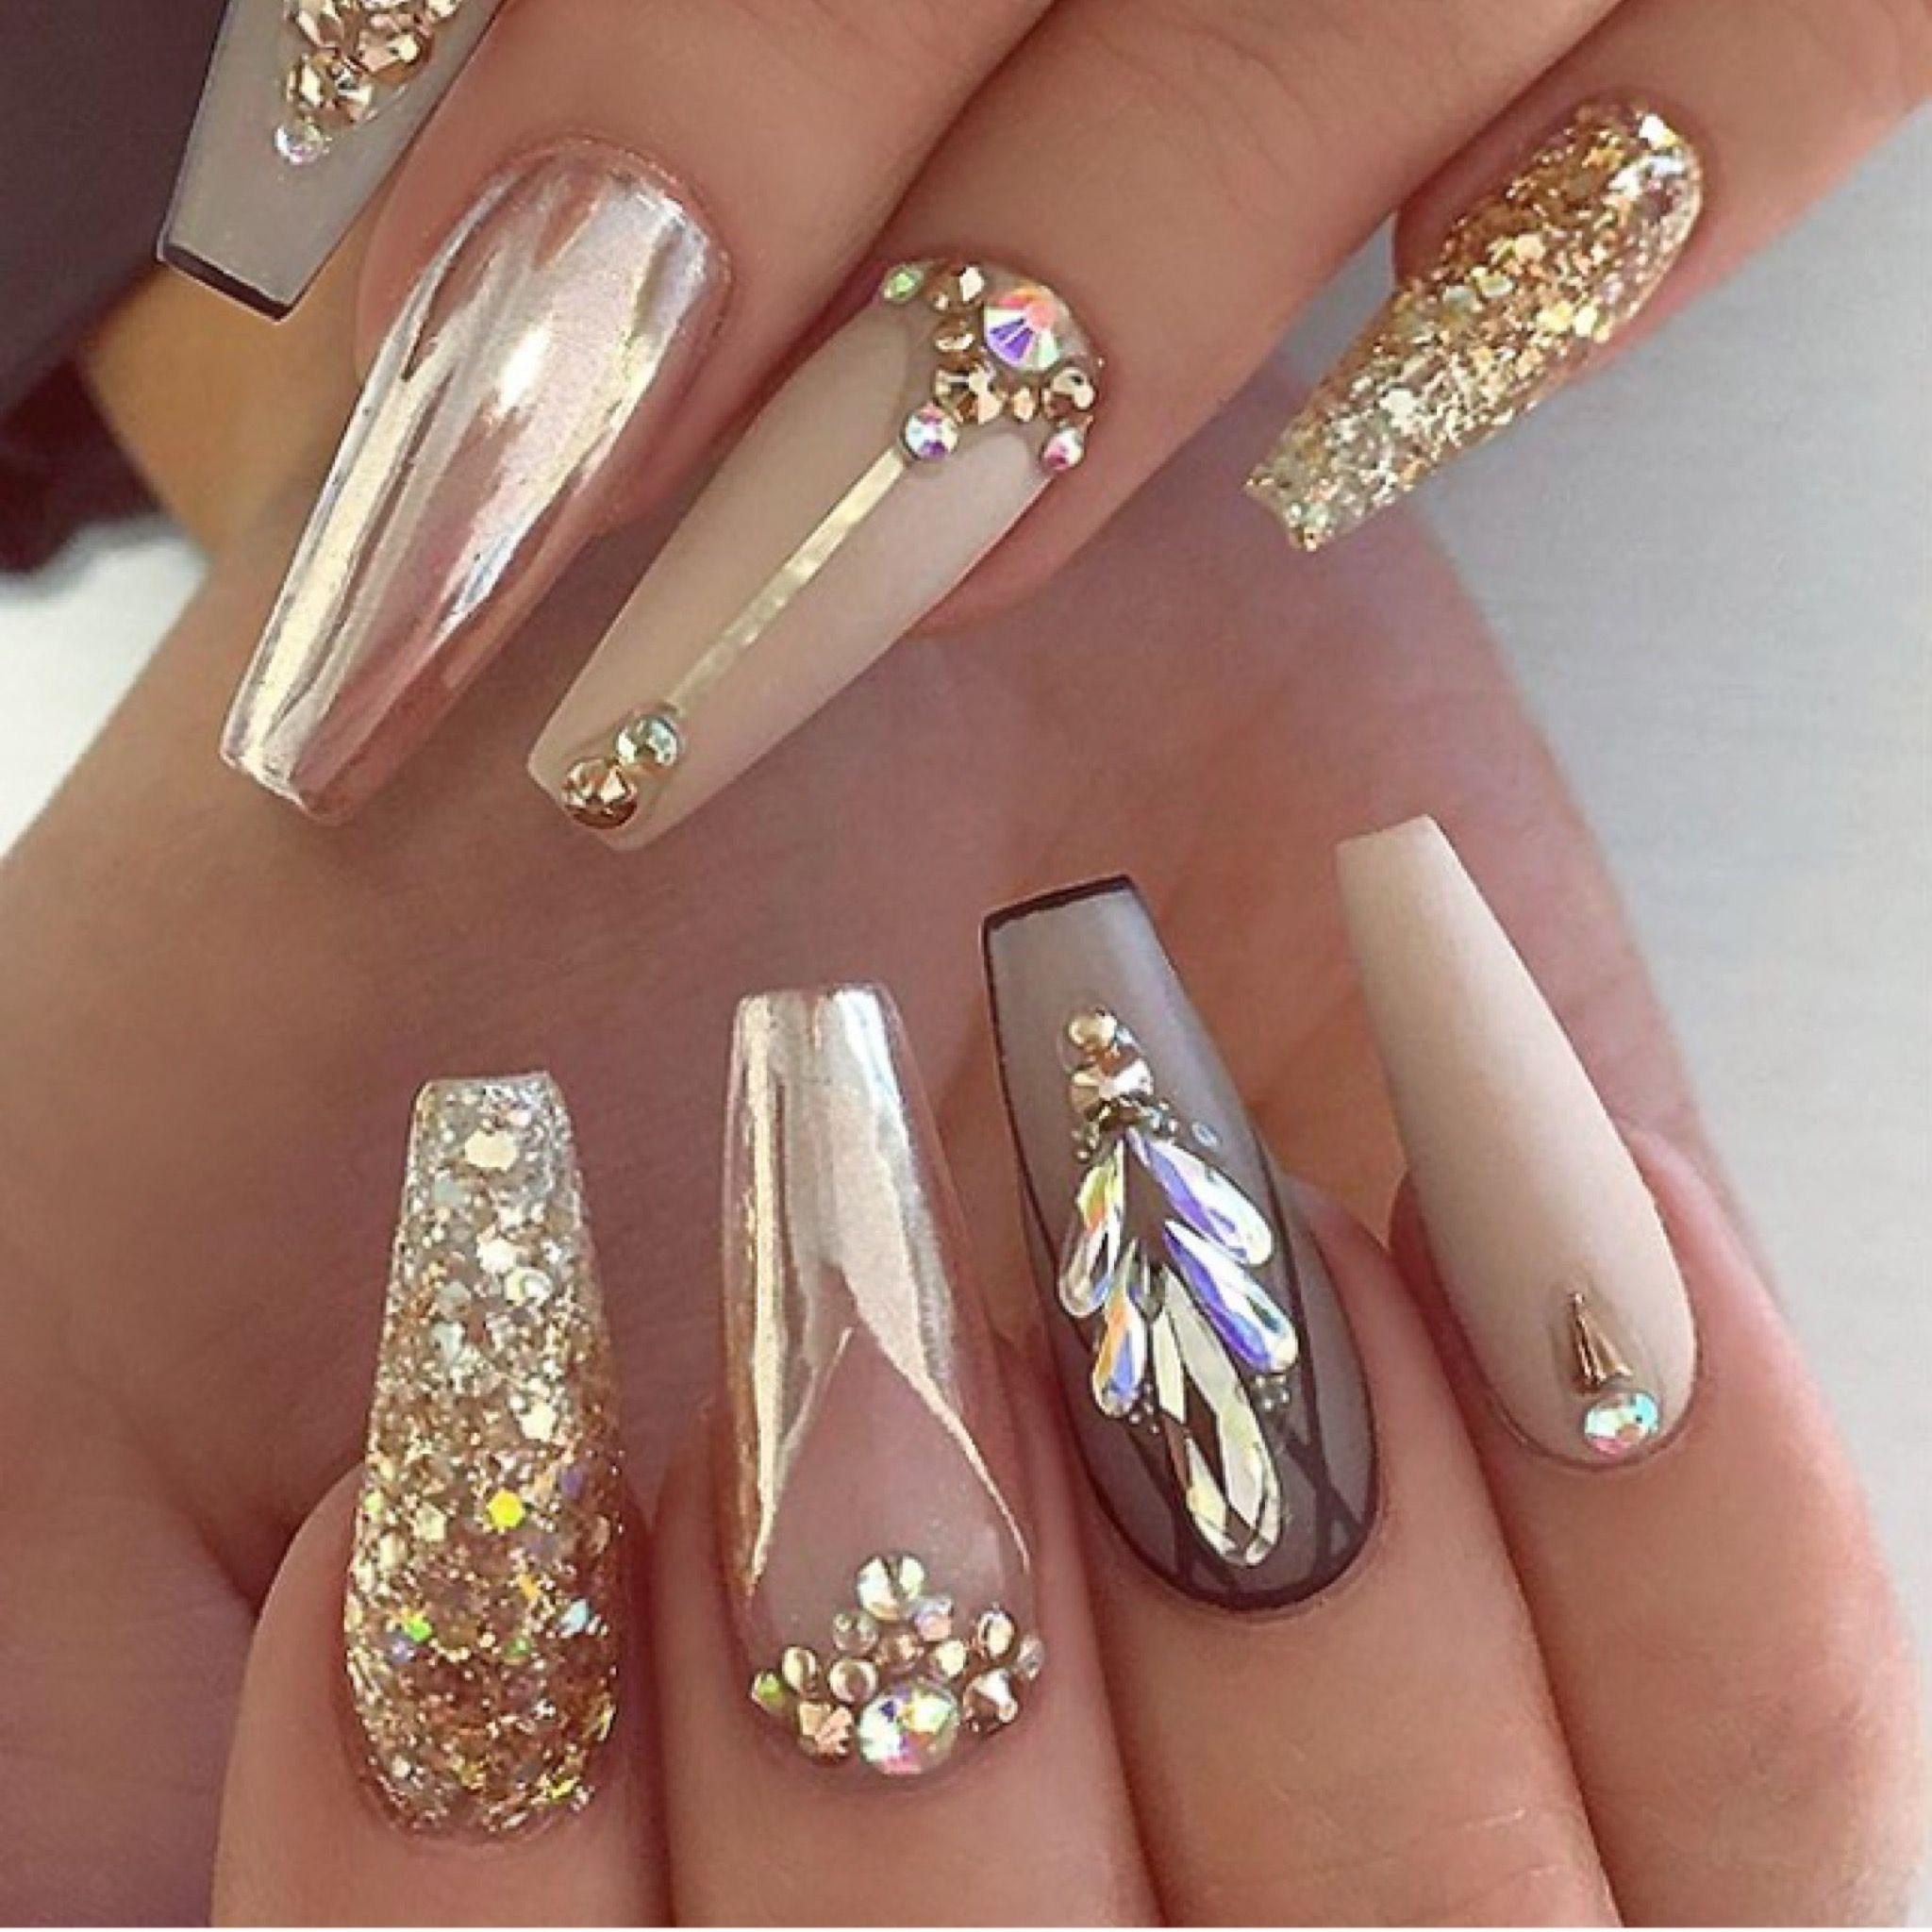 Theodora | Nails , 2018 | Pinterest | Nails, Nail Art  ...